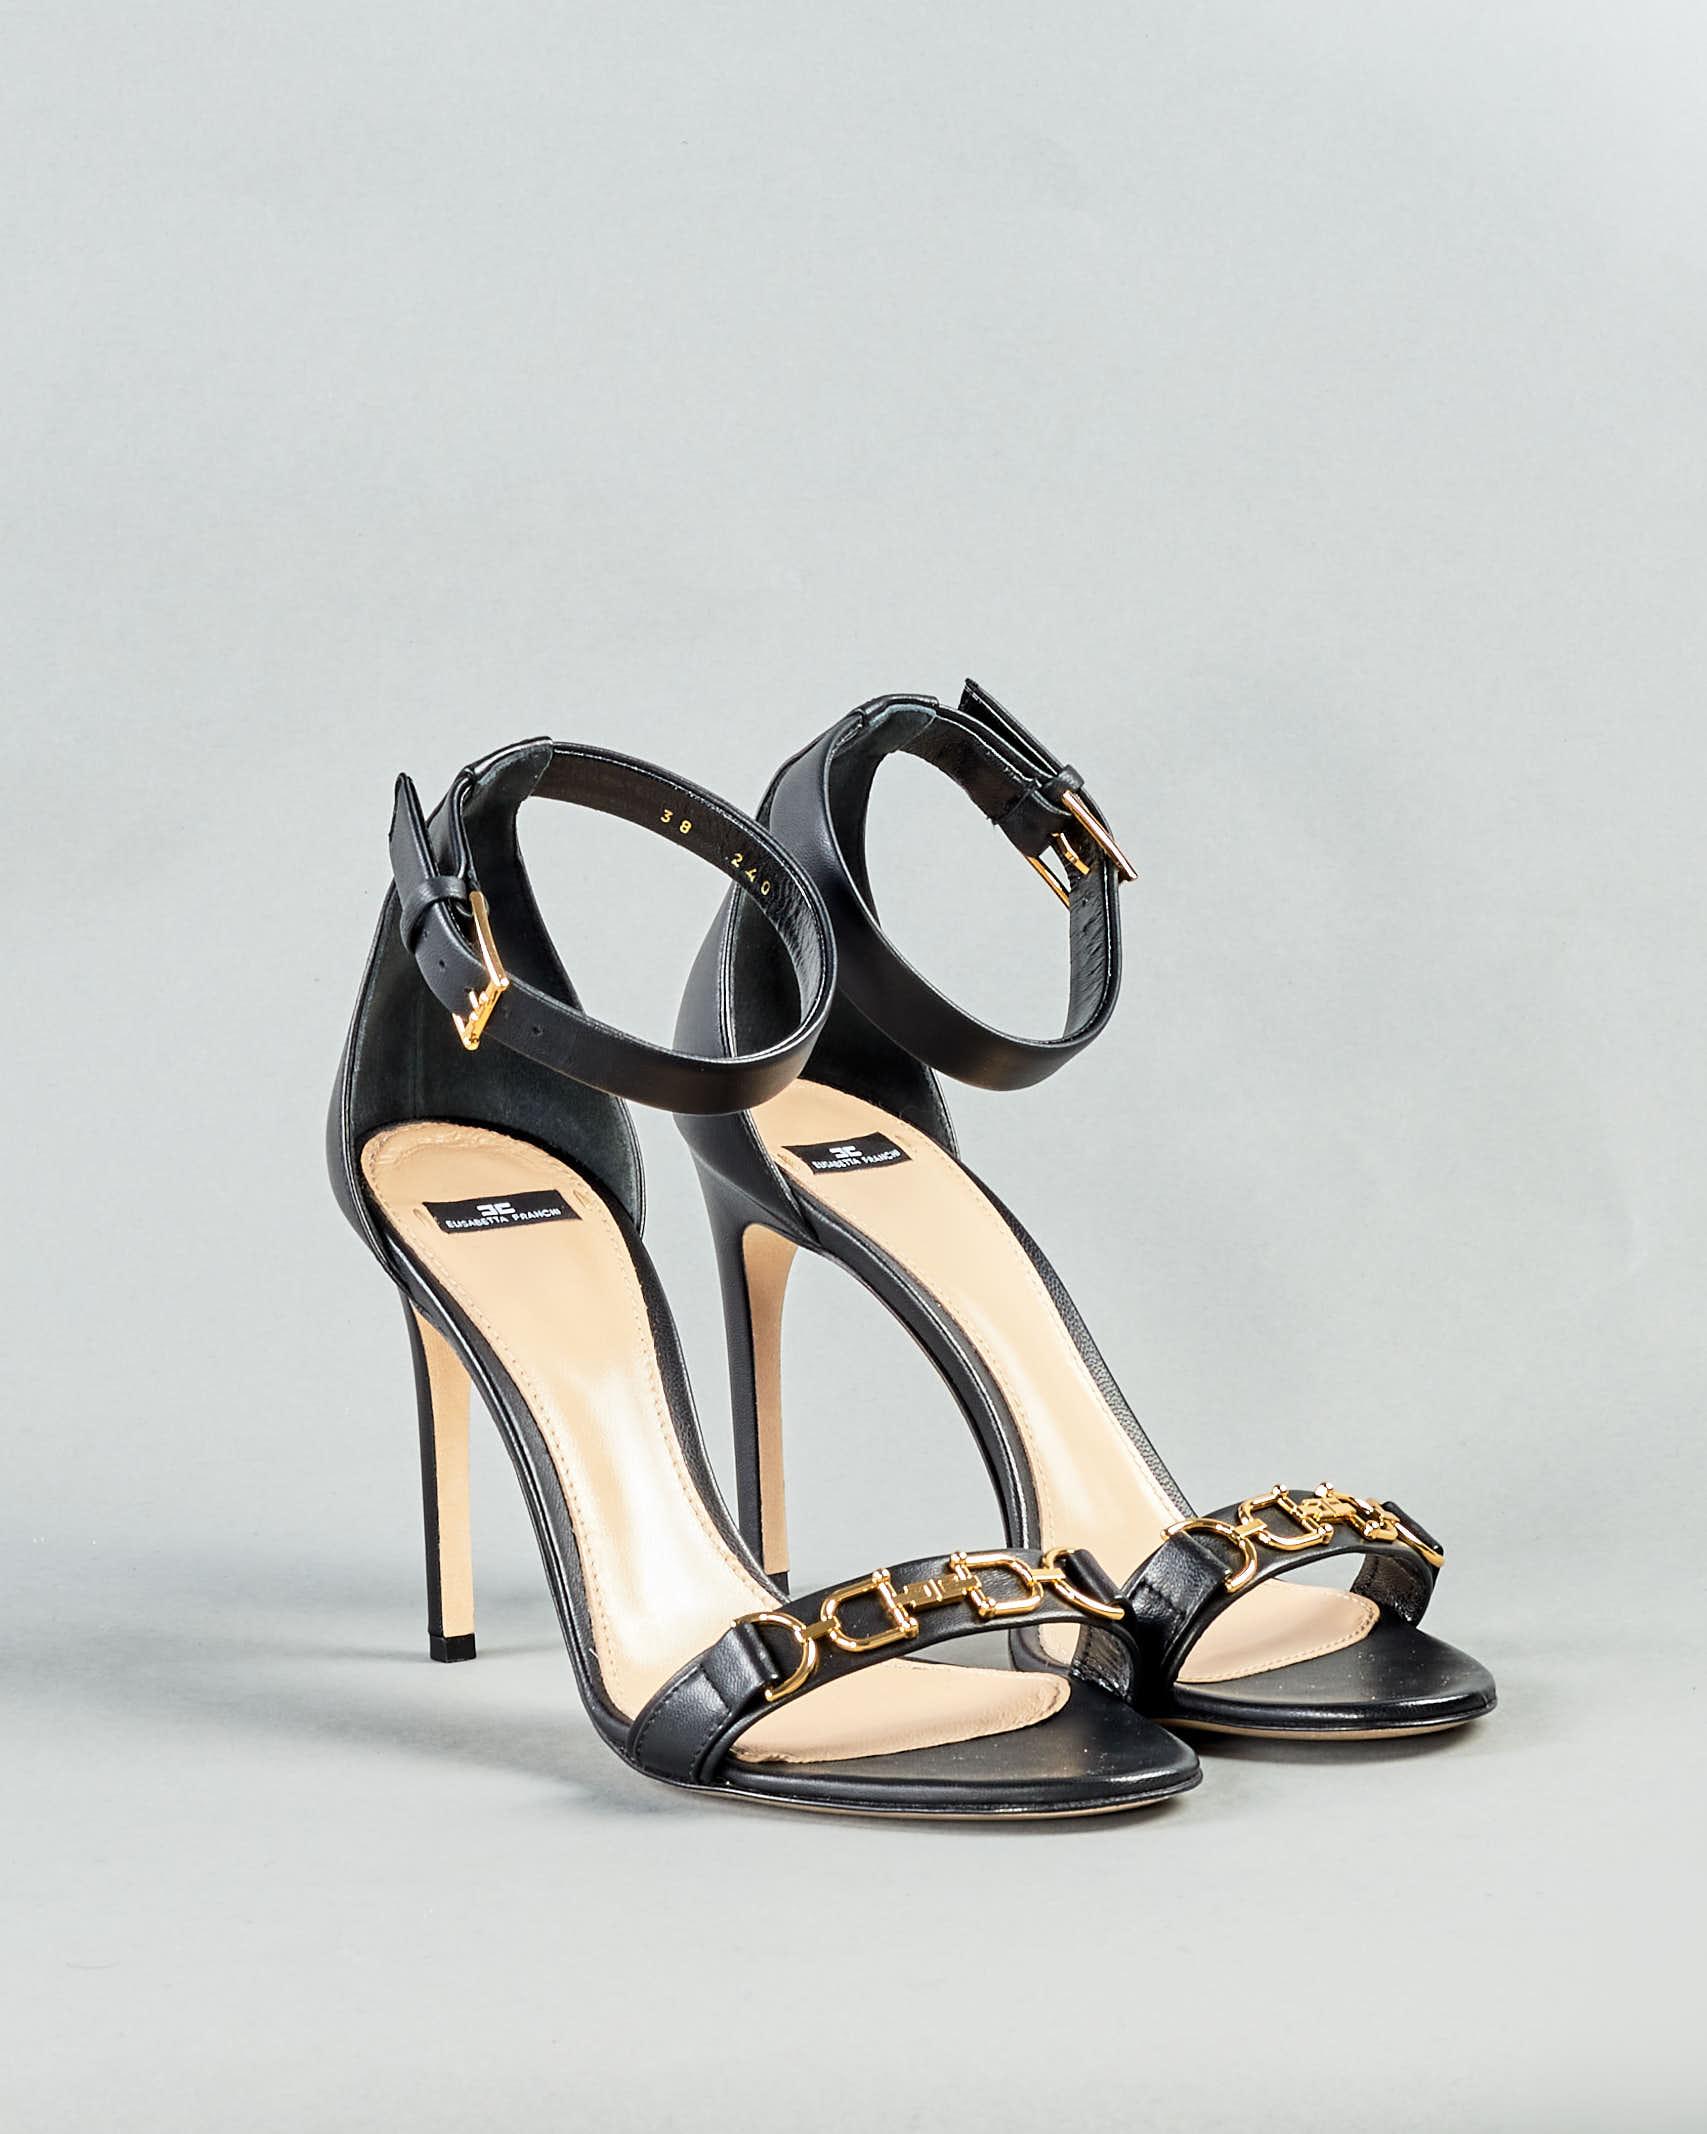 Sandalo con logo Elisabetta Franchi ELISABETTA FRANCHI   Sandali   SA97L11E2110